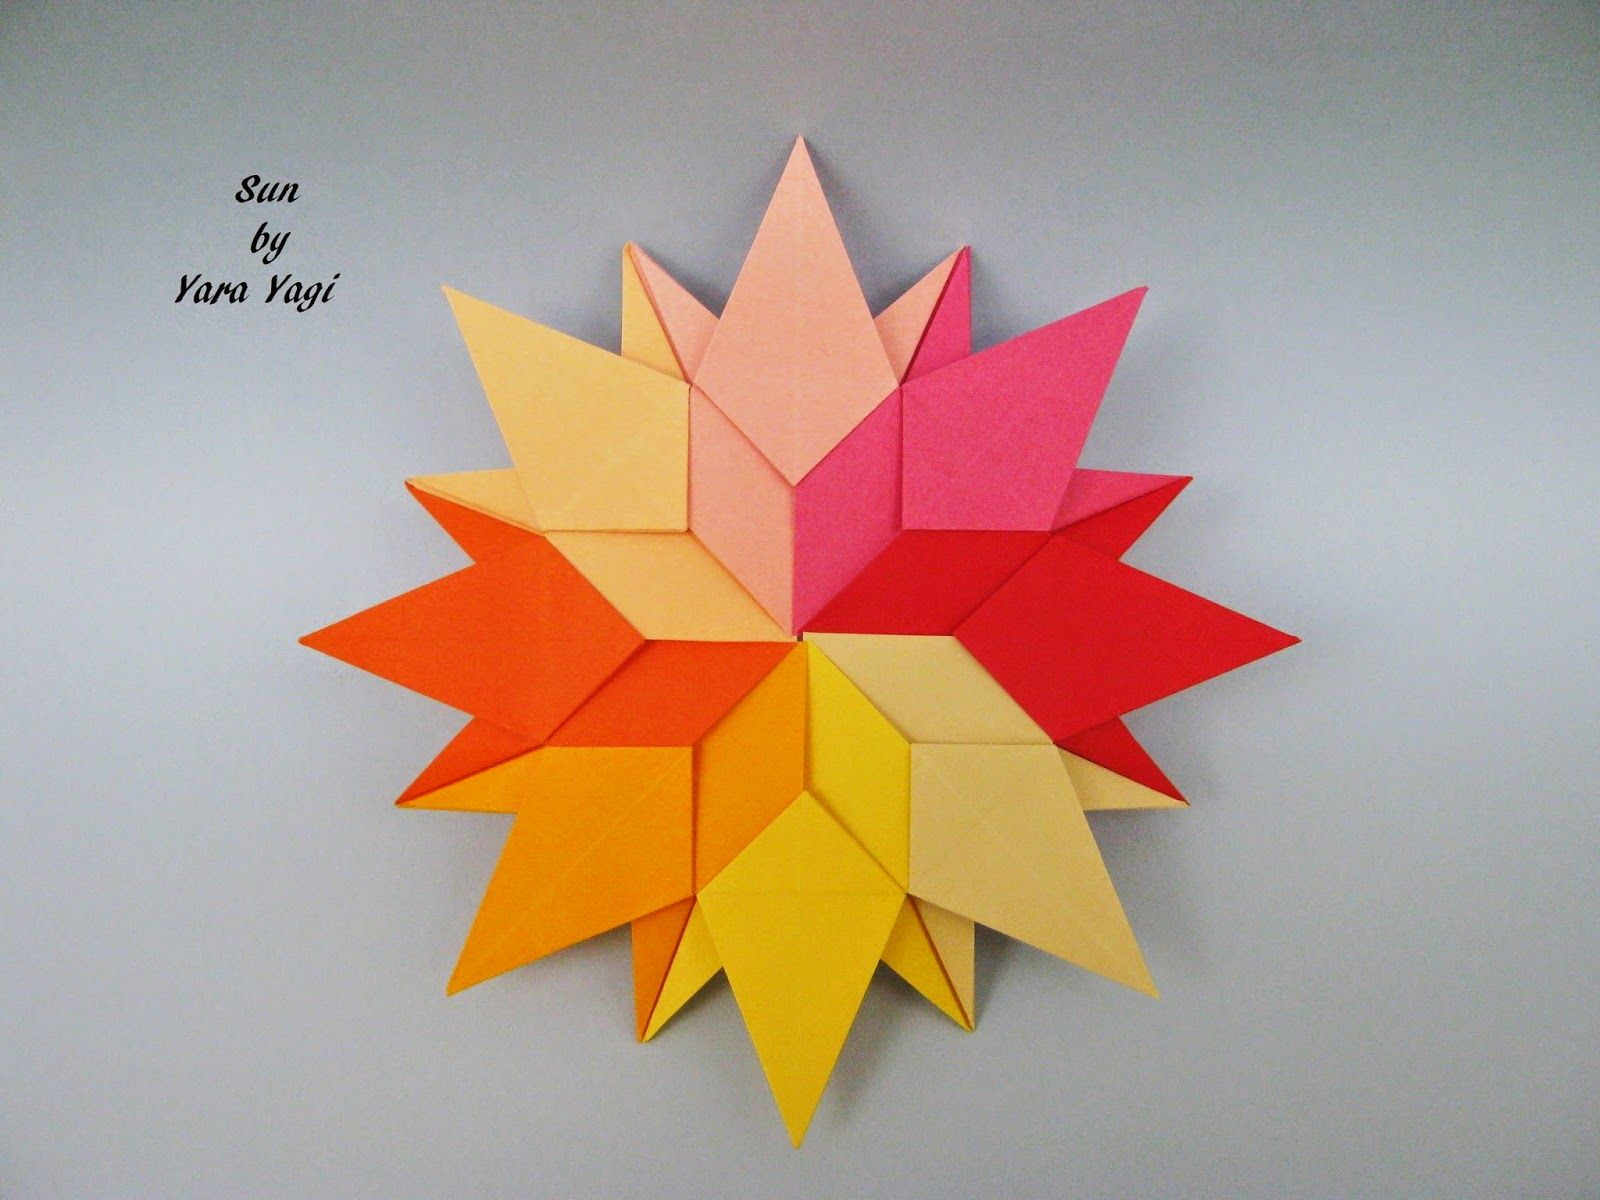 cool modular origami diagram chinese 6 pin dc cdi wiring sun by yara yagi photo